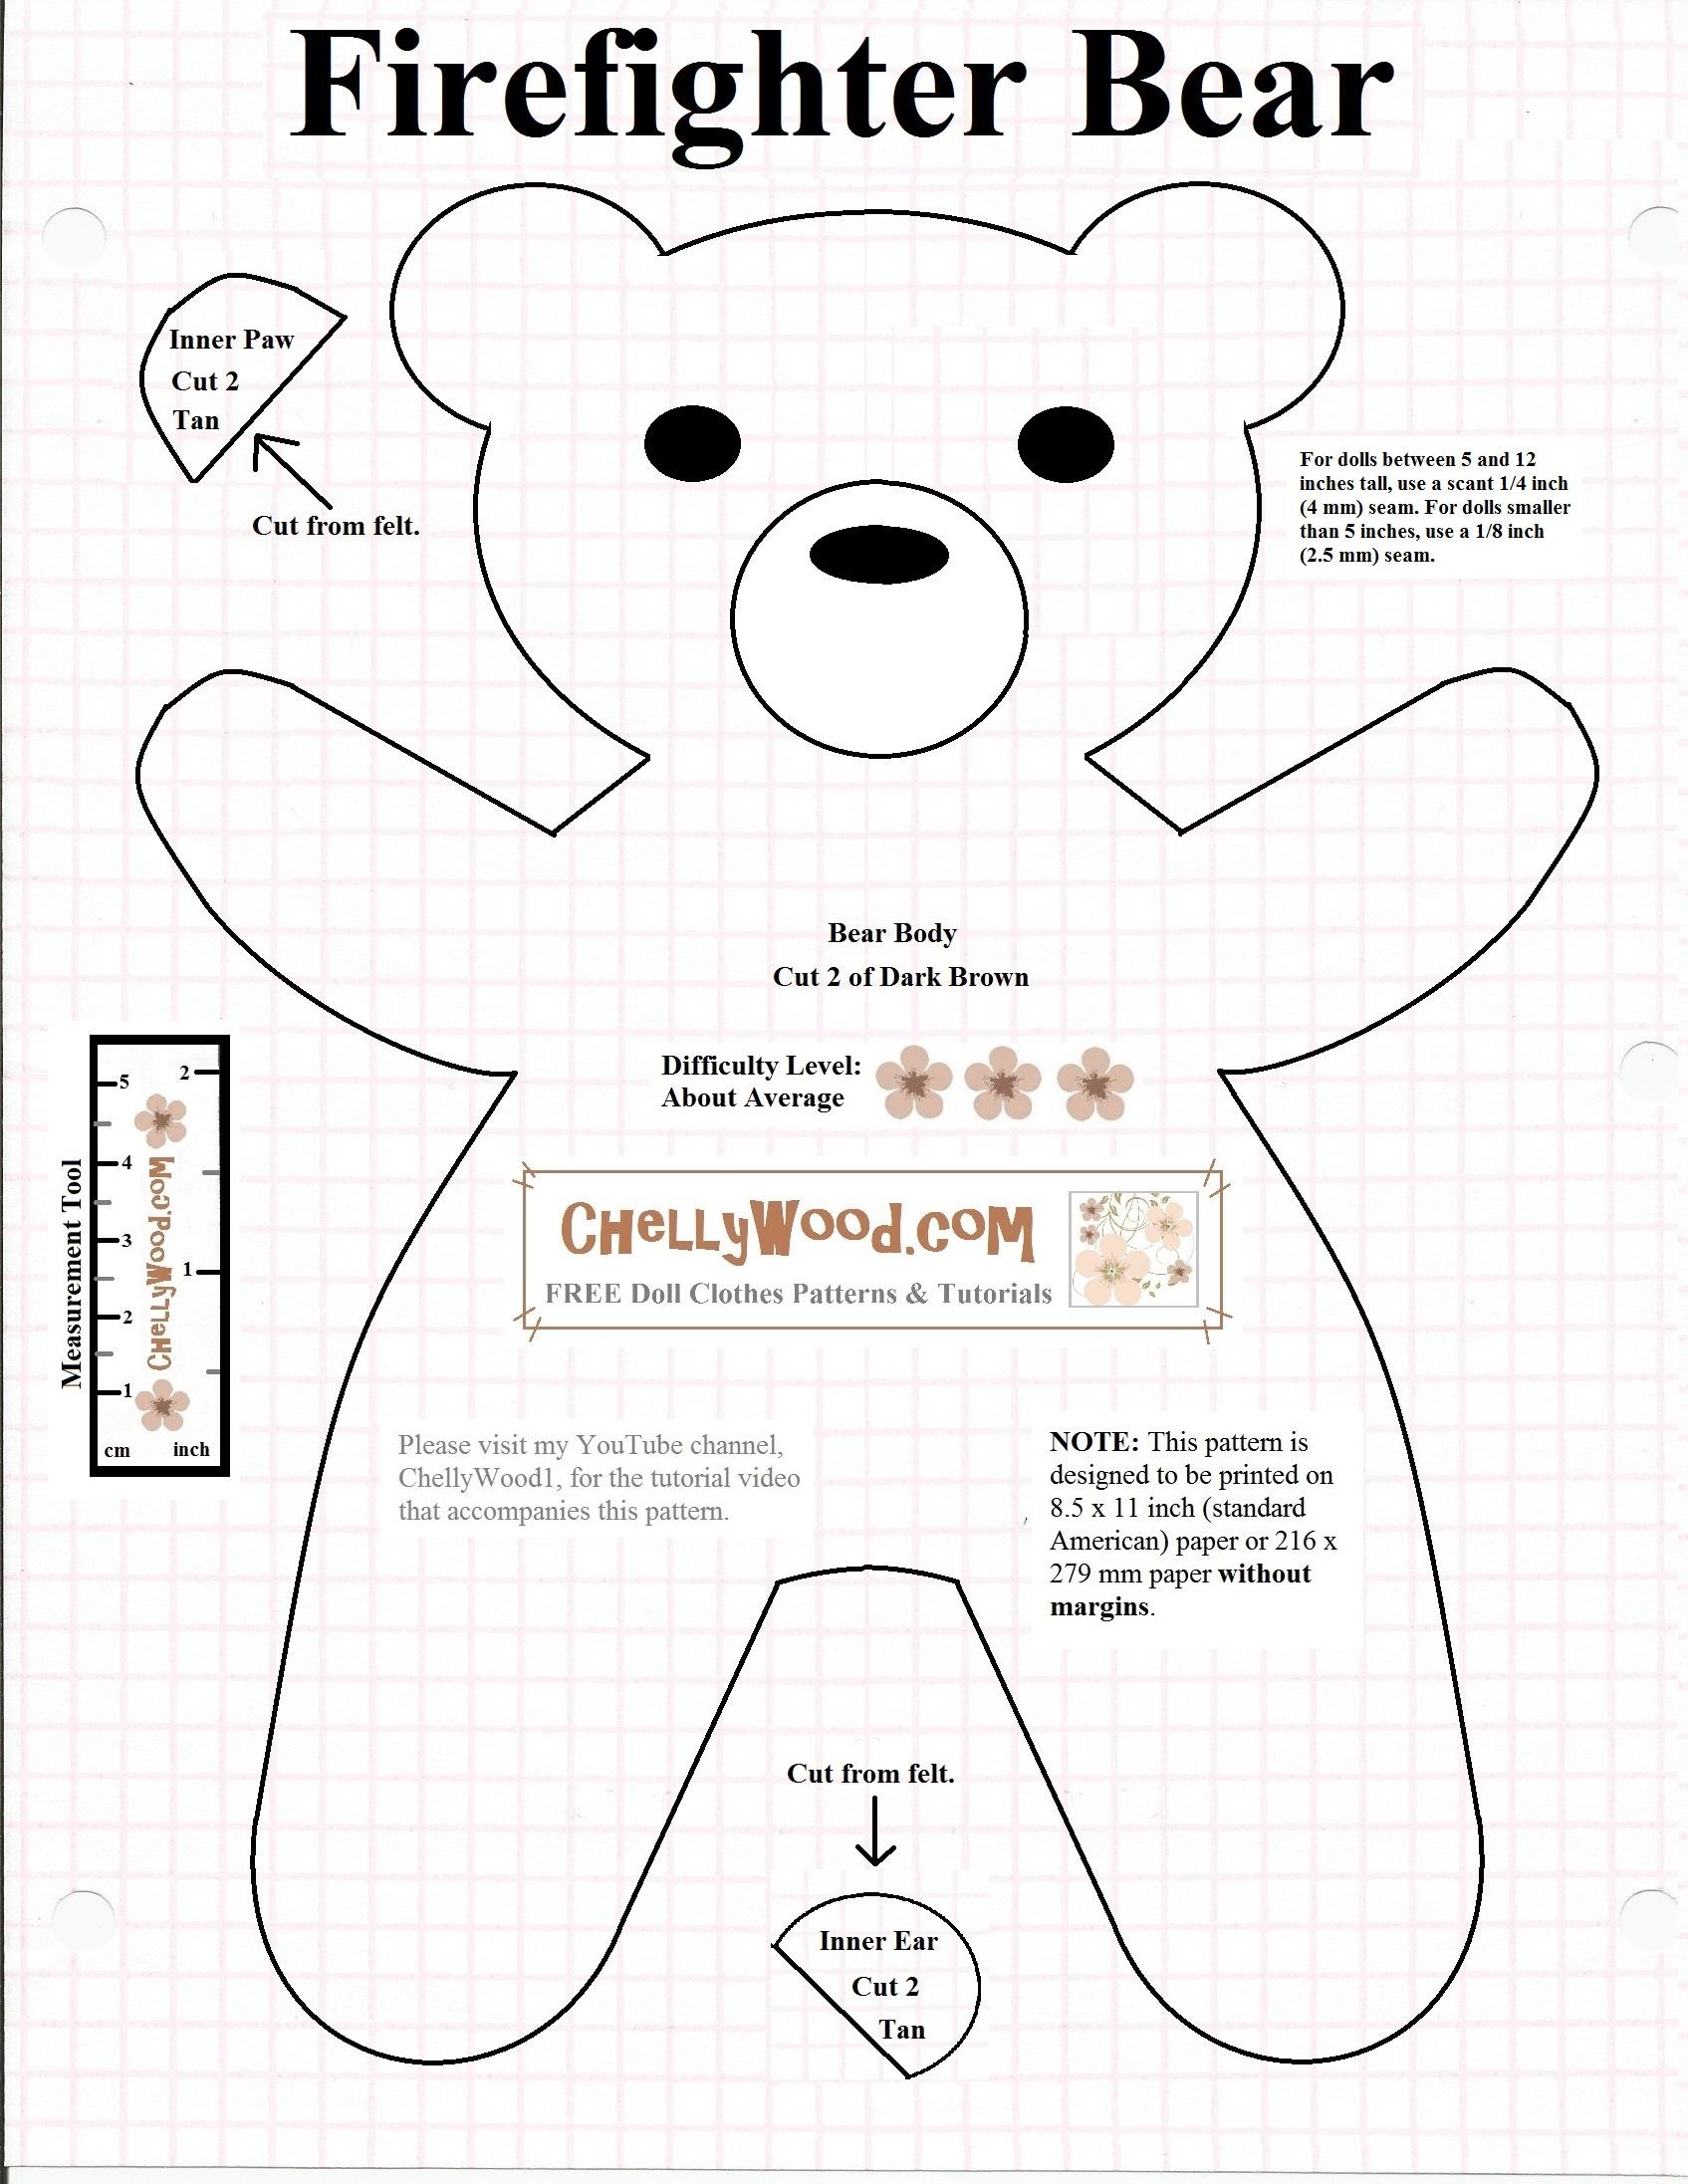 Free Printable Smokeybear Or Teddybear Sewing Pattern